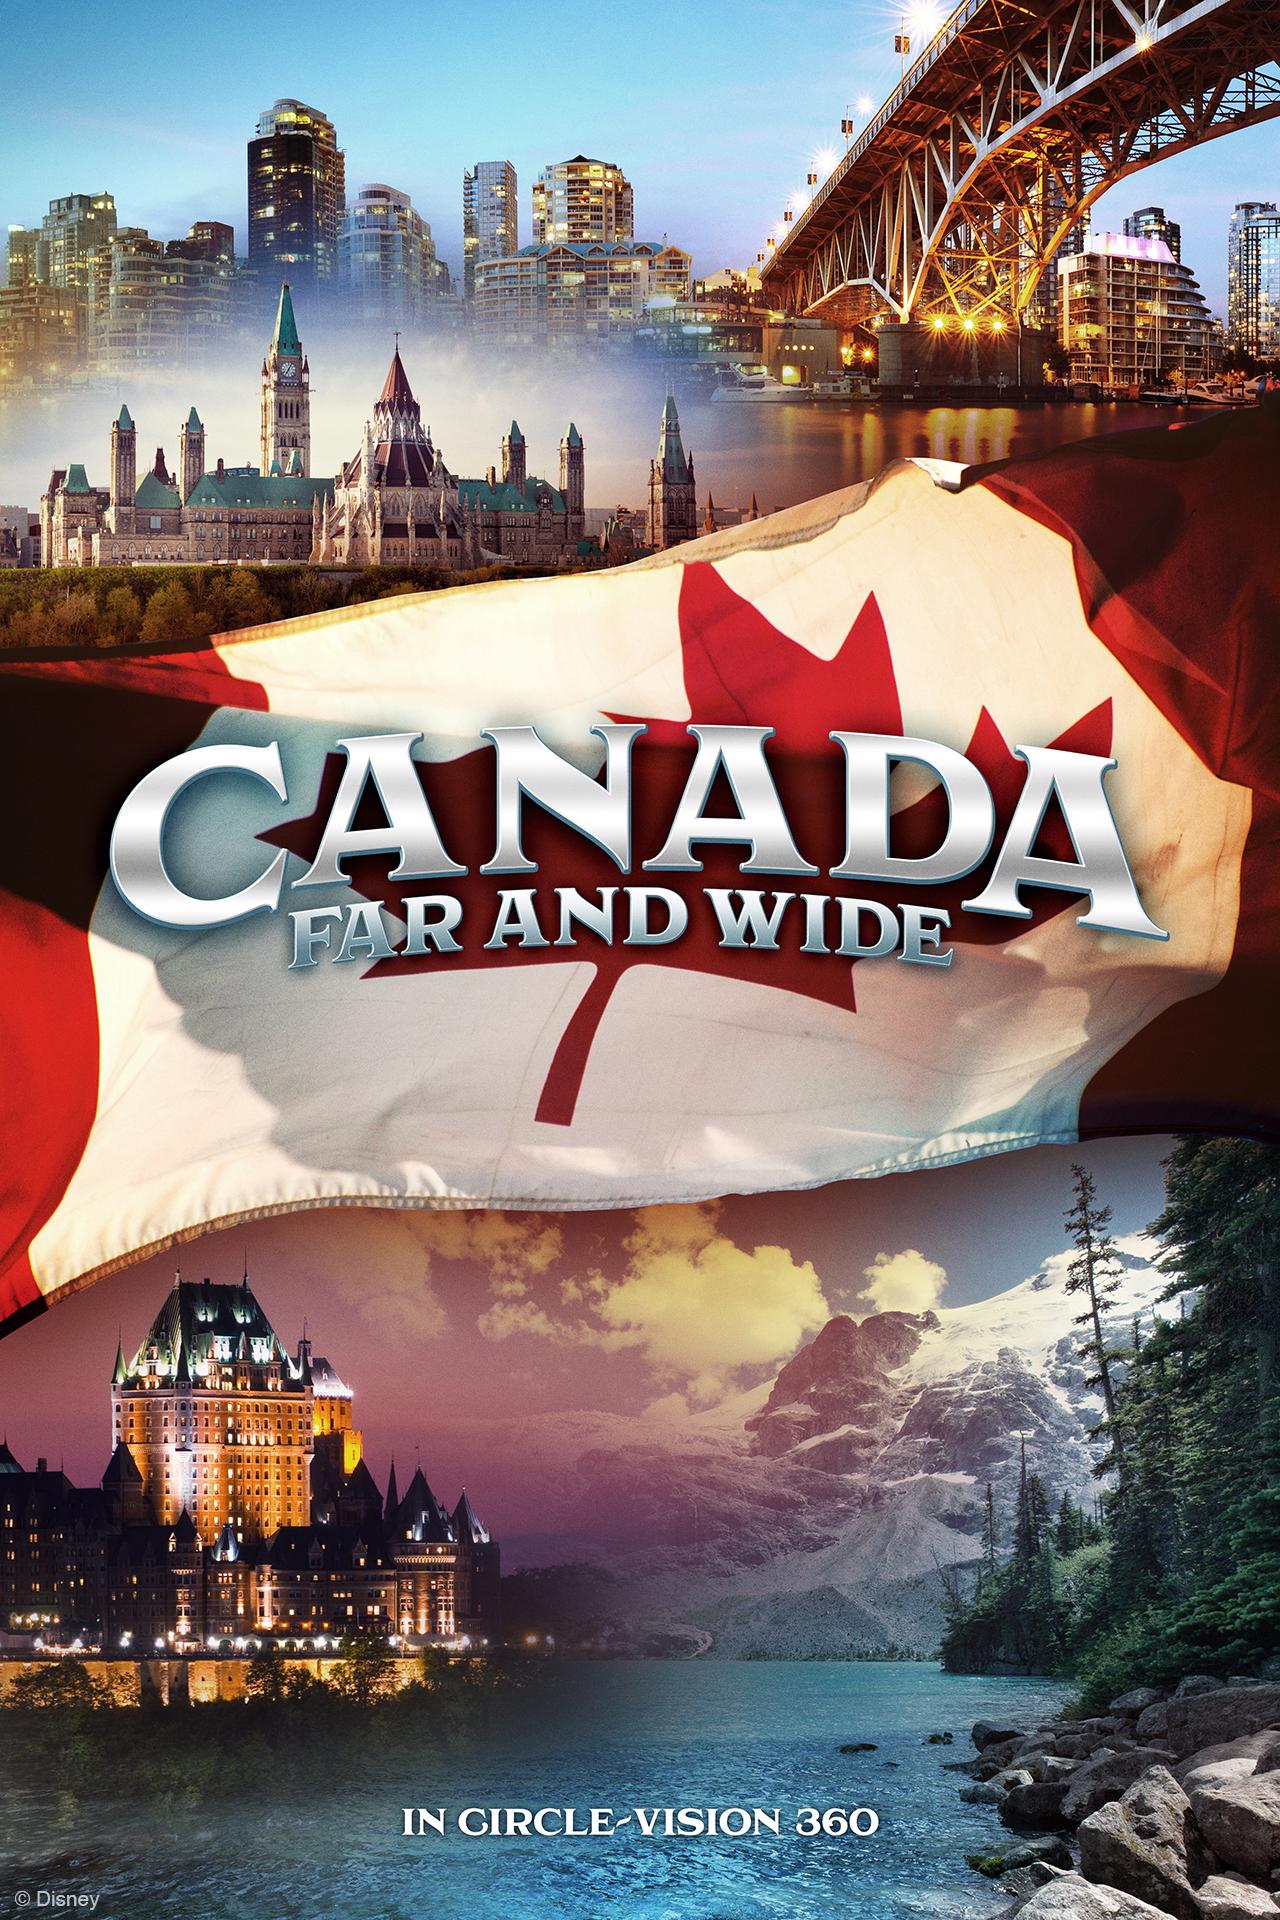 Canada Epcot updates